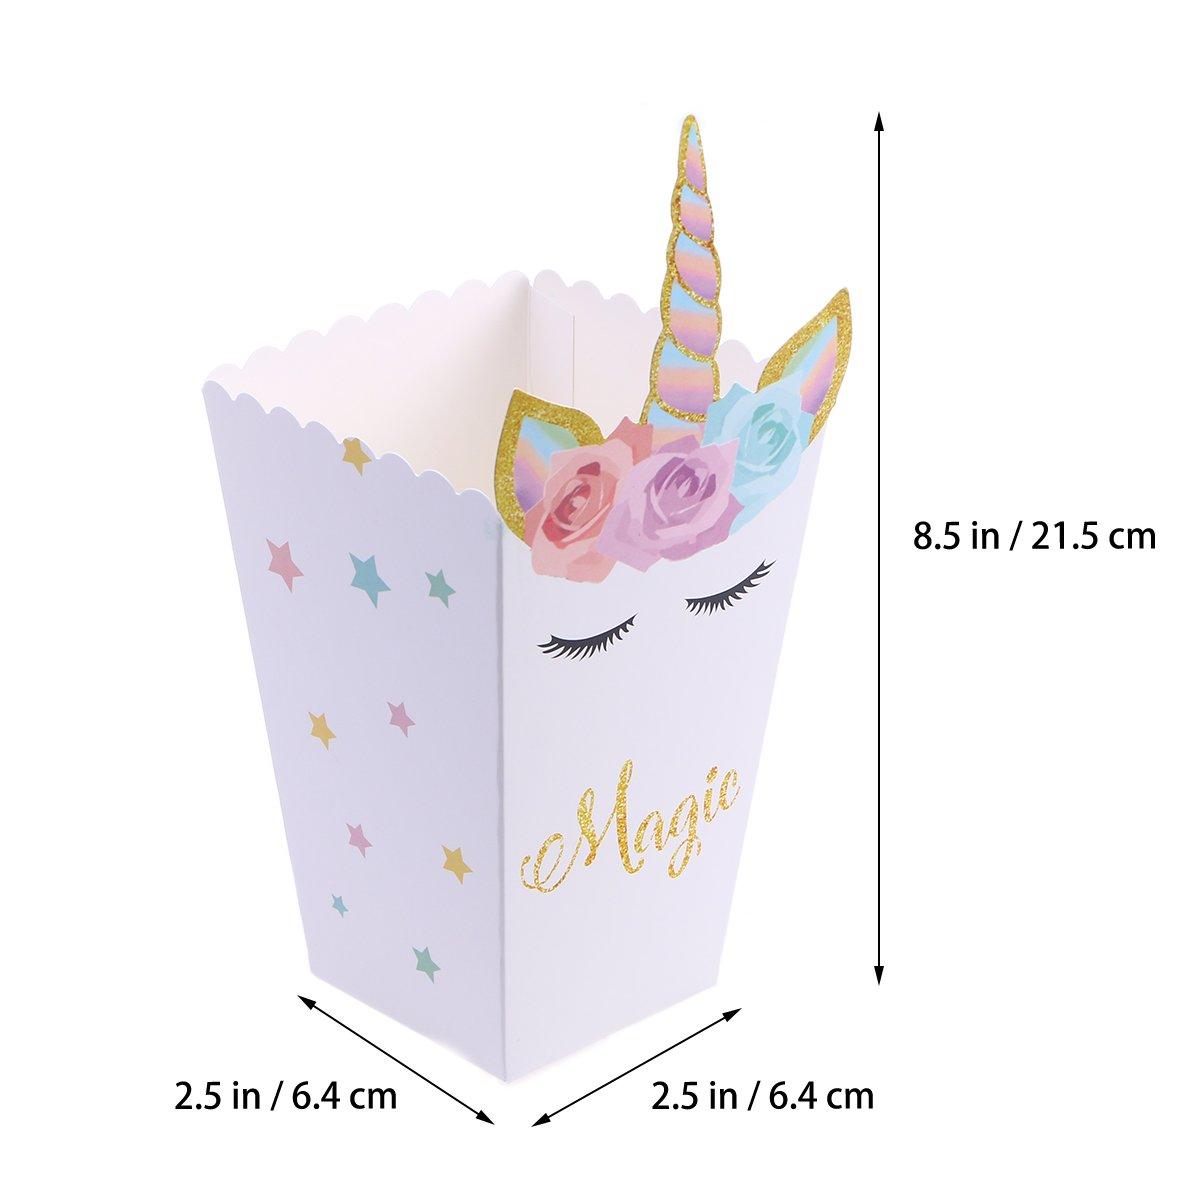 Amazon.com: TOYMYTOY Unicorn Popcorn Boxes Paper Popcorn Bag Theme Party Favor Supplies Decoration Set of 12: Toys & Games